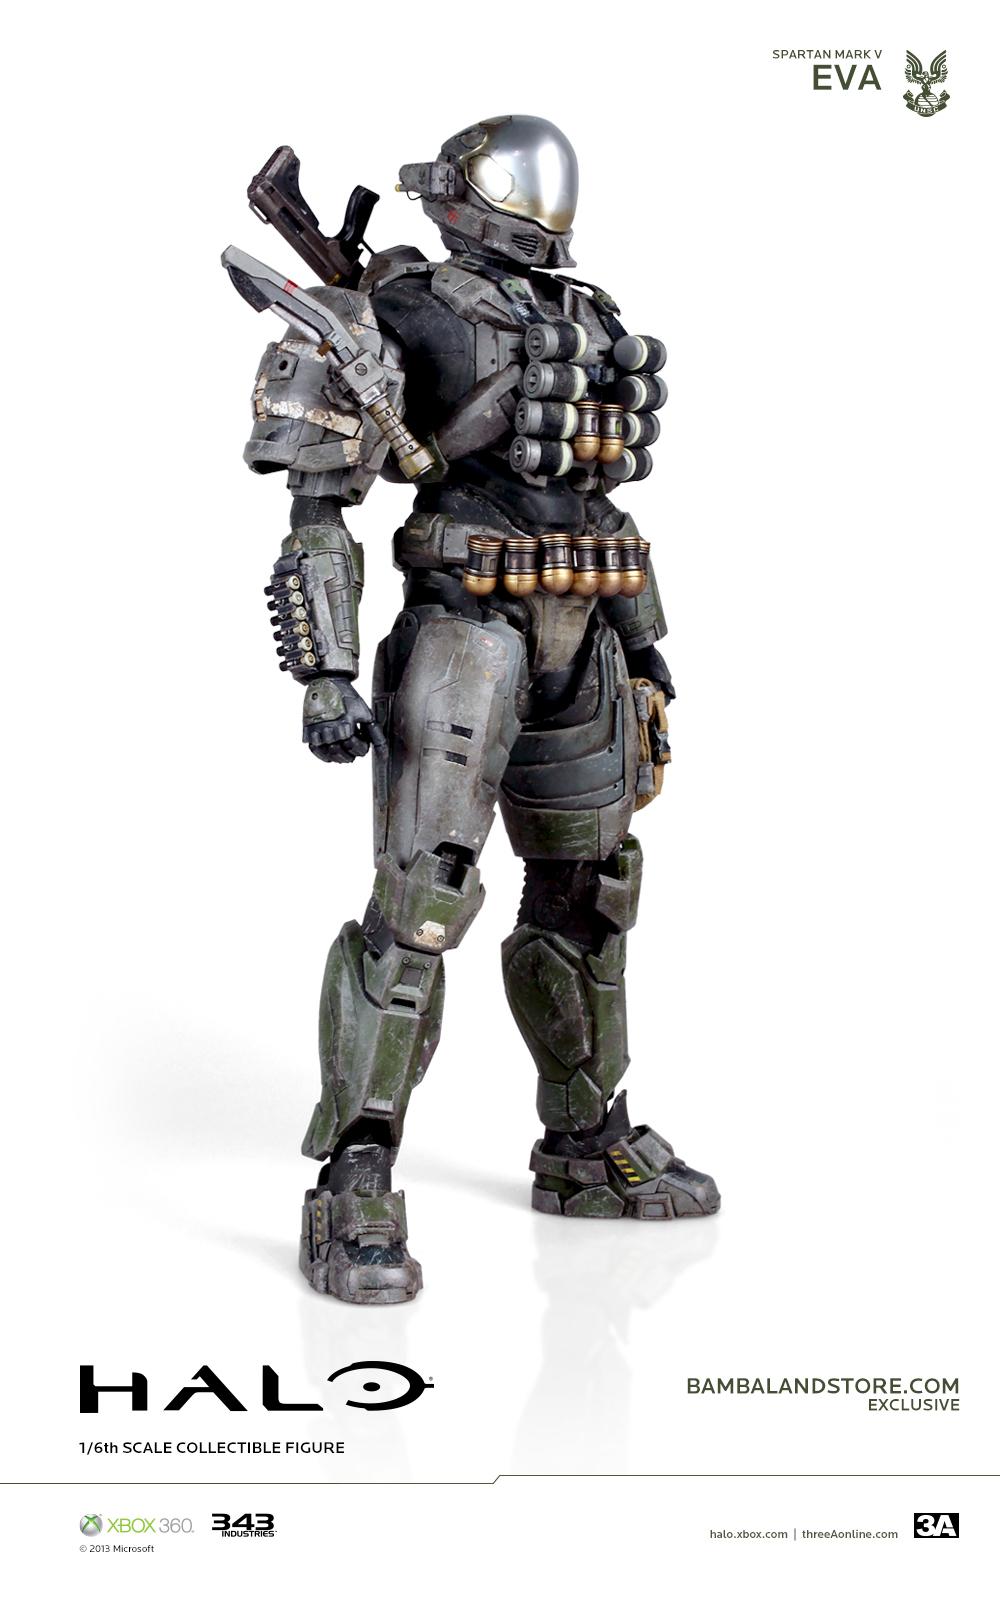 threeA 3A Halo HaloReach Spartan gaming videogame